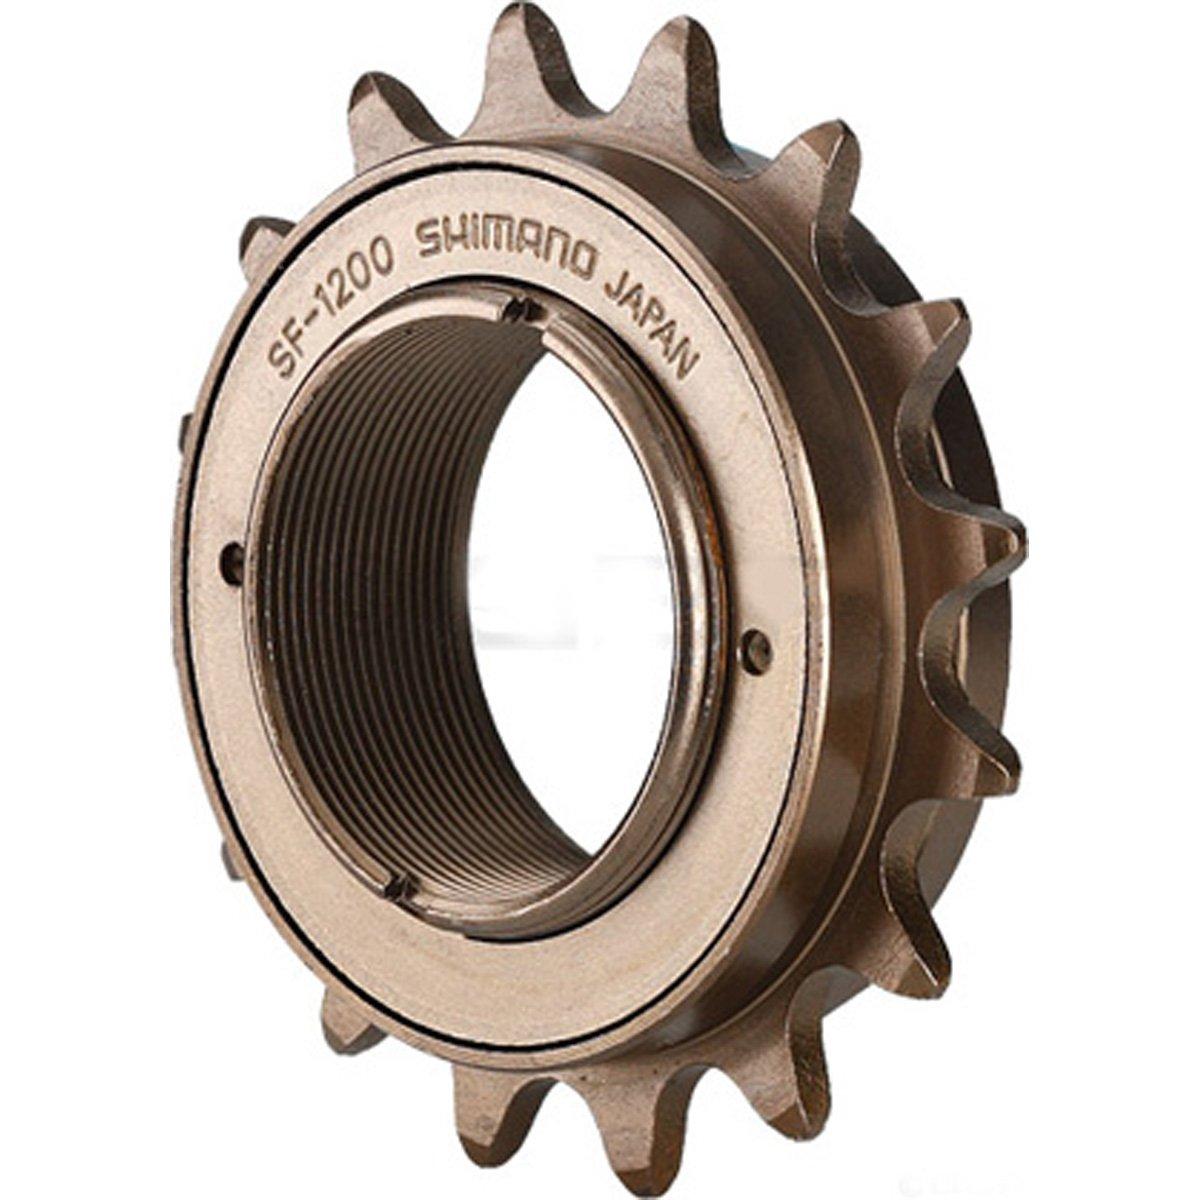 Shimano SF-1200 Single Speed Freewheel, 20Tx1/8-Inch 1 Speed ISF120020